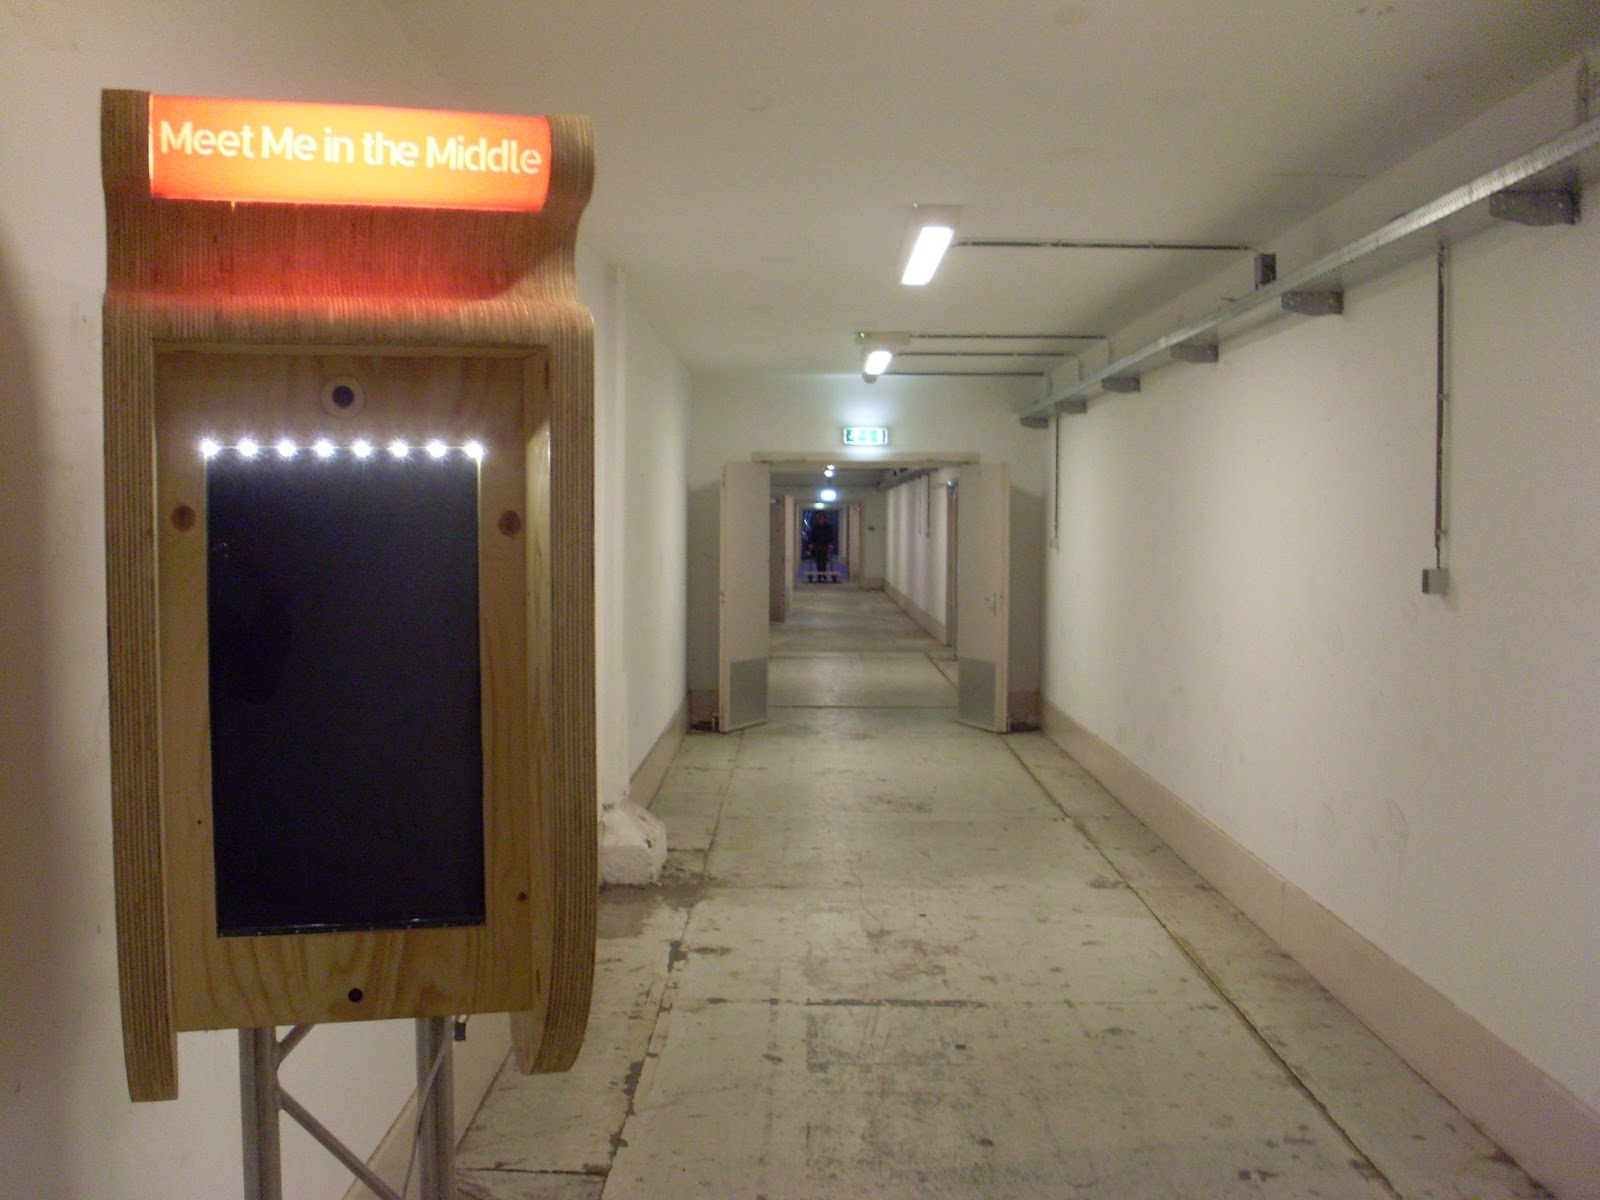 An odd device in the corridor